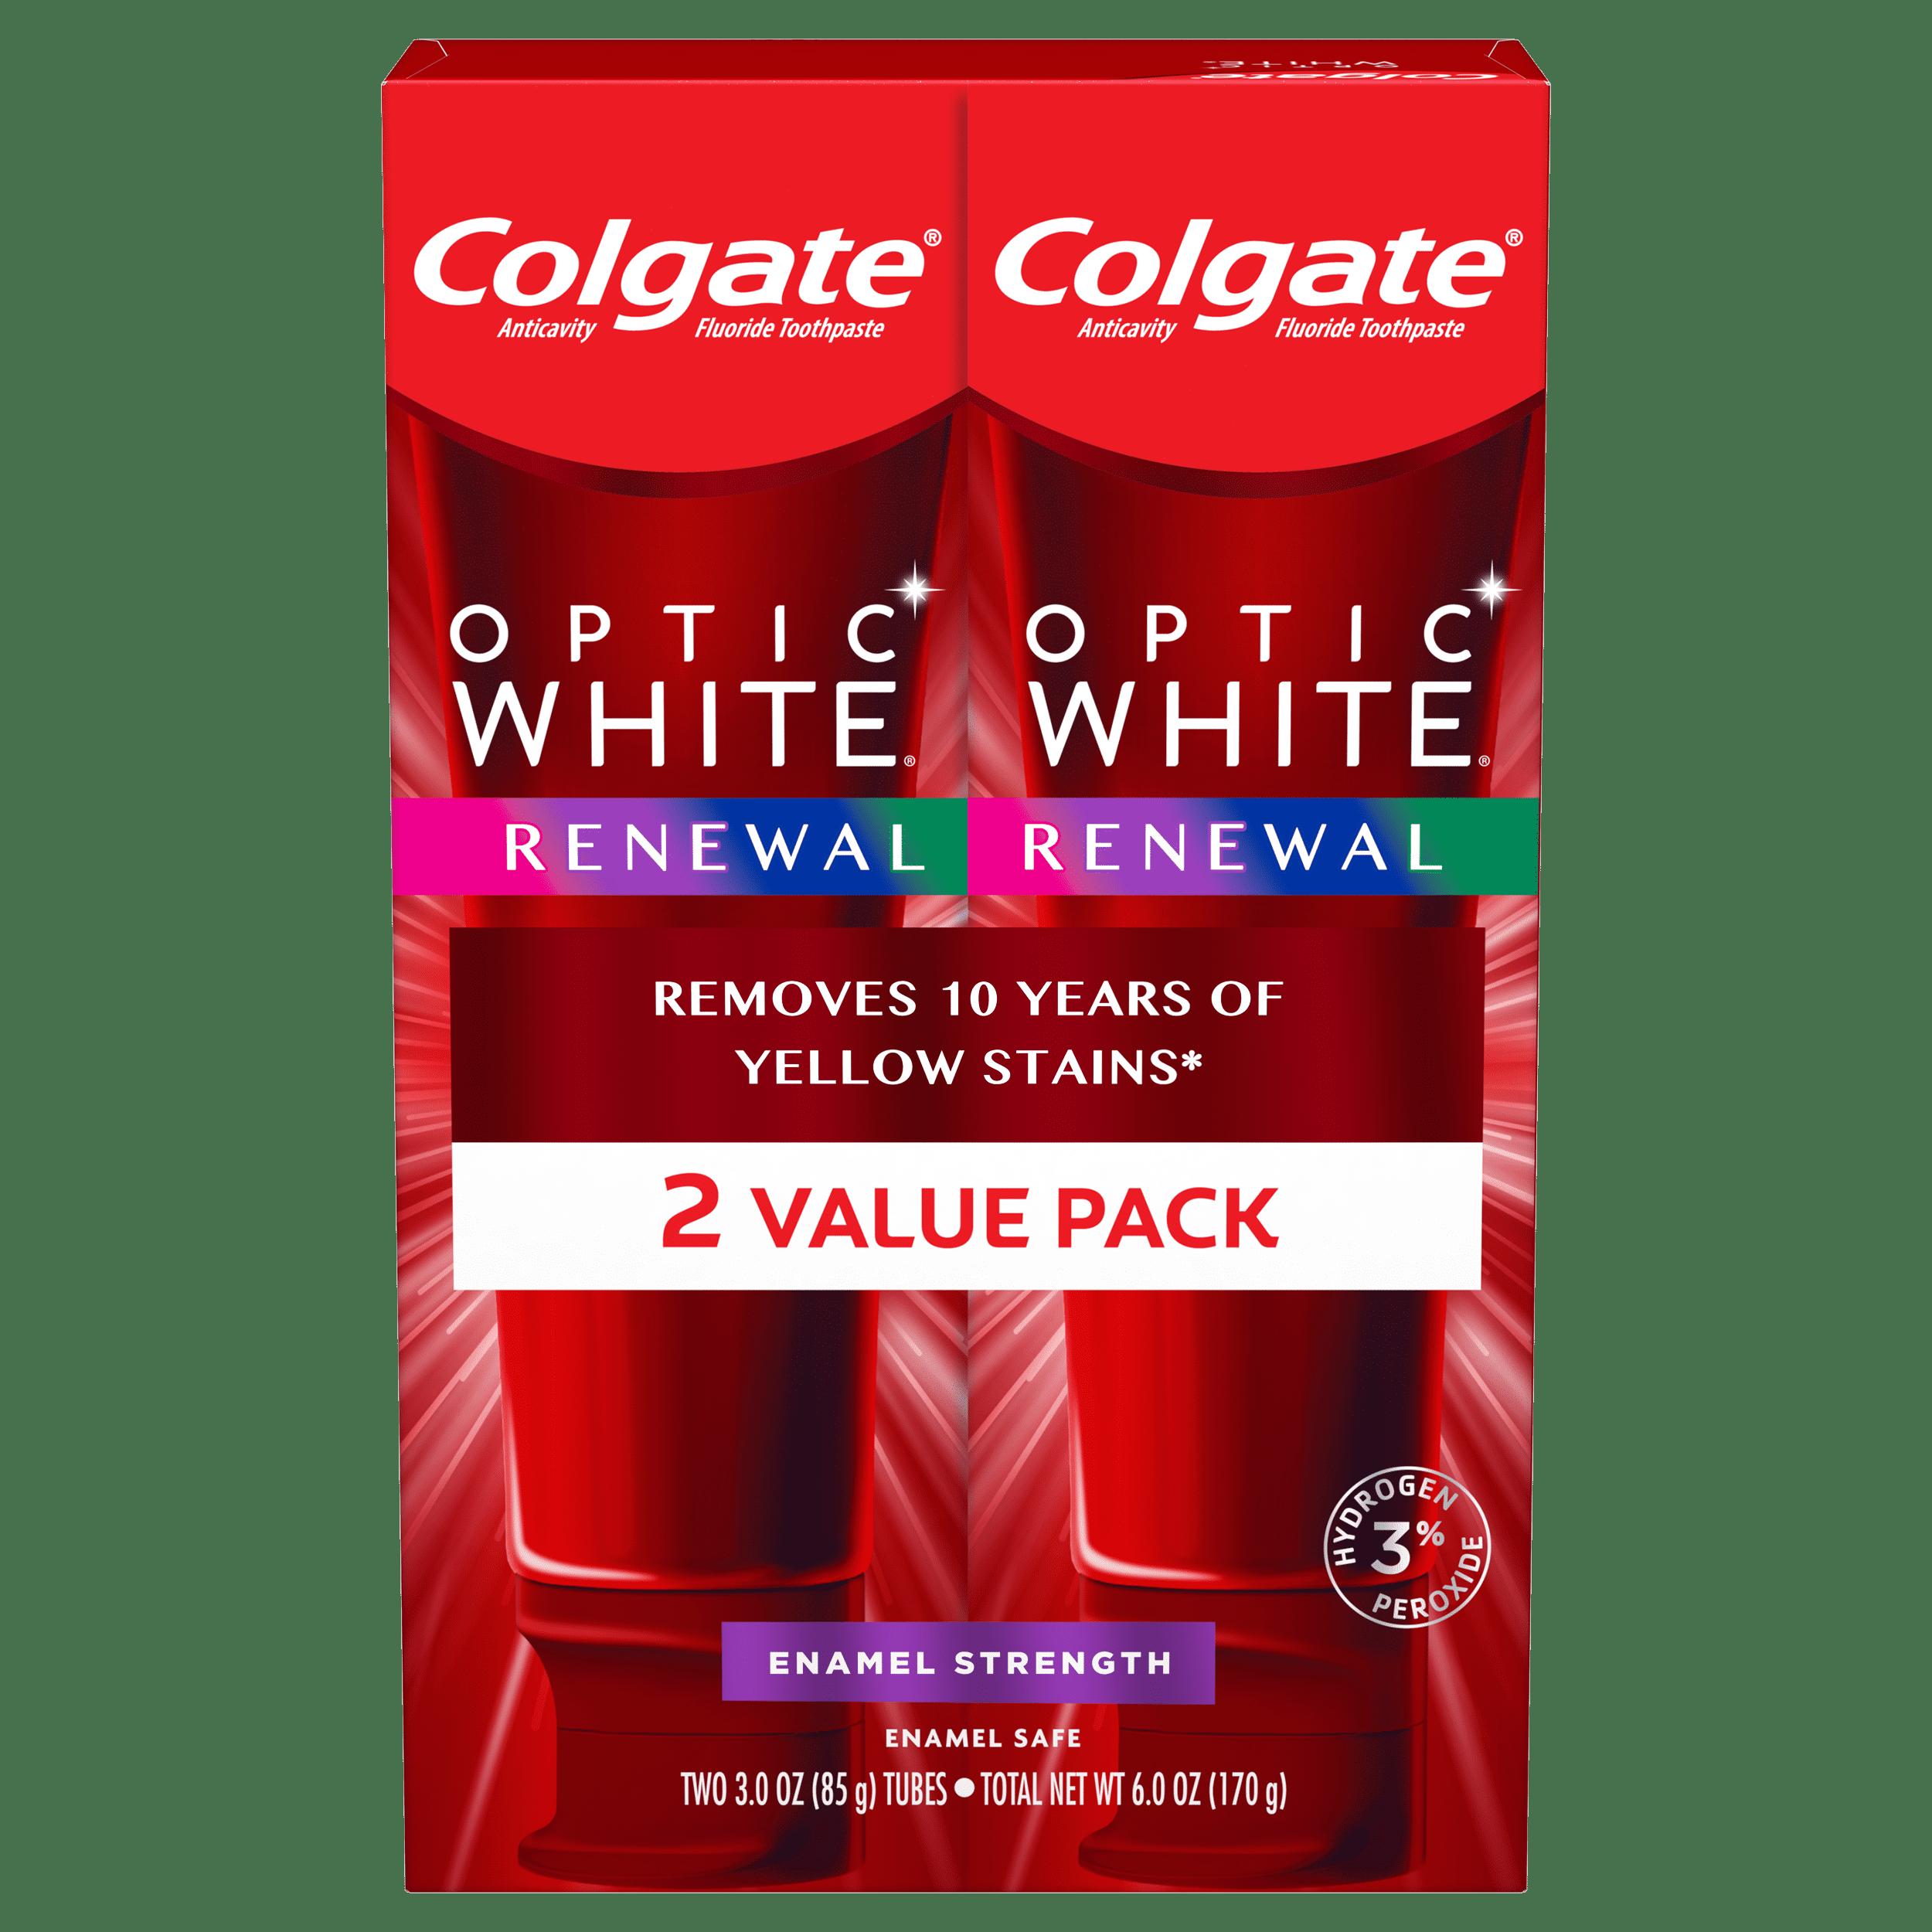 Colgate Optic White Renewal Teeth Whitening Toothpaste Enamel